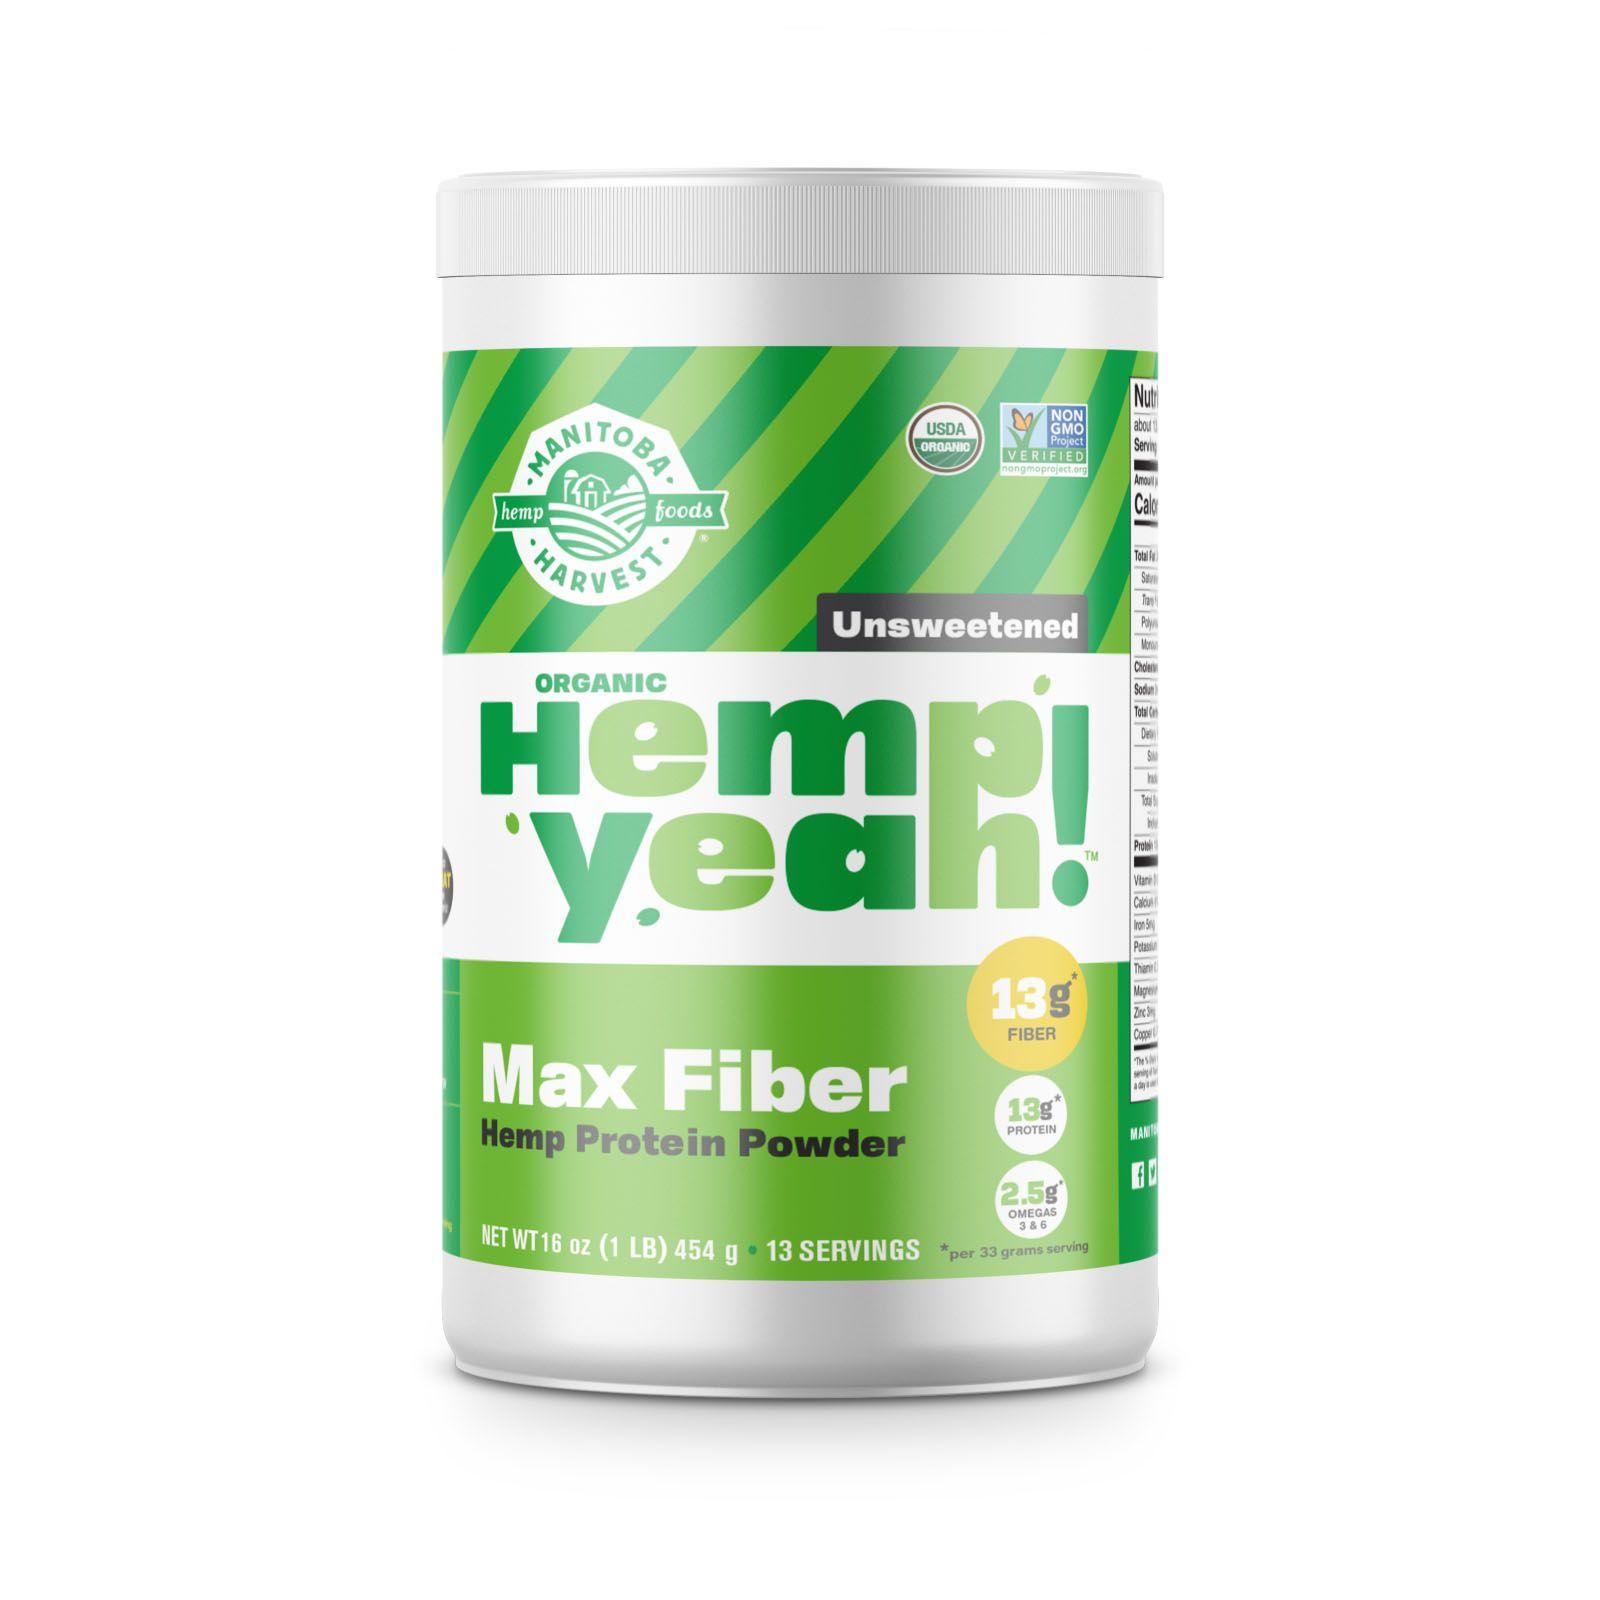 Hemp Yeah! Max Fiber Hemp Protein Powder Unsweetened 16 oz. (454 g)